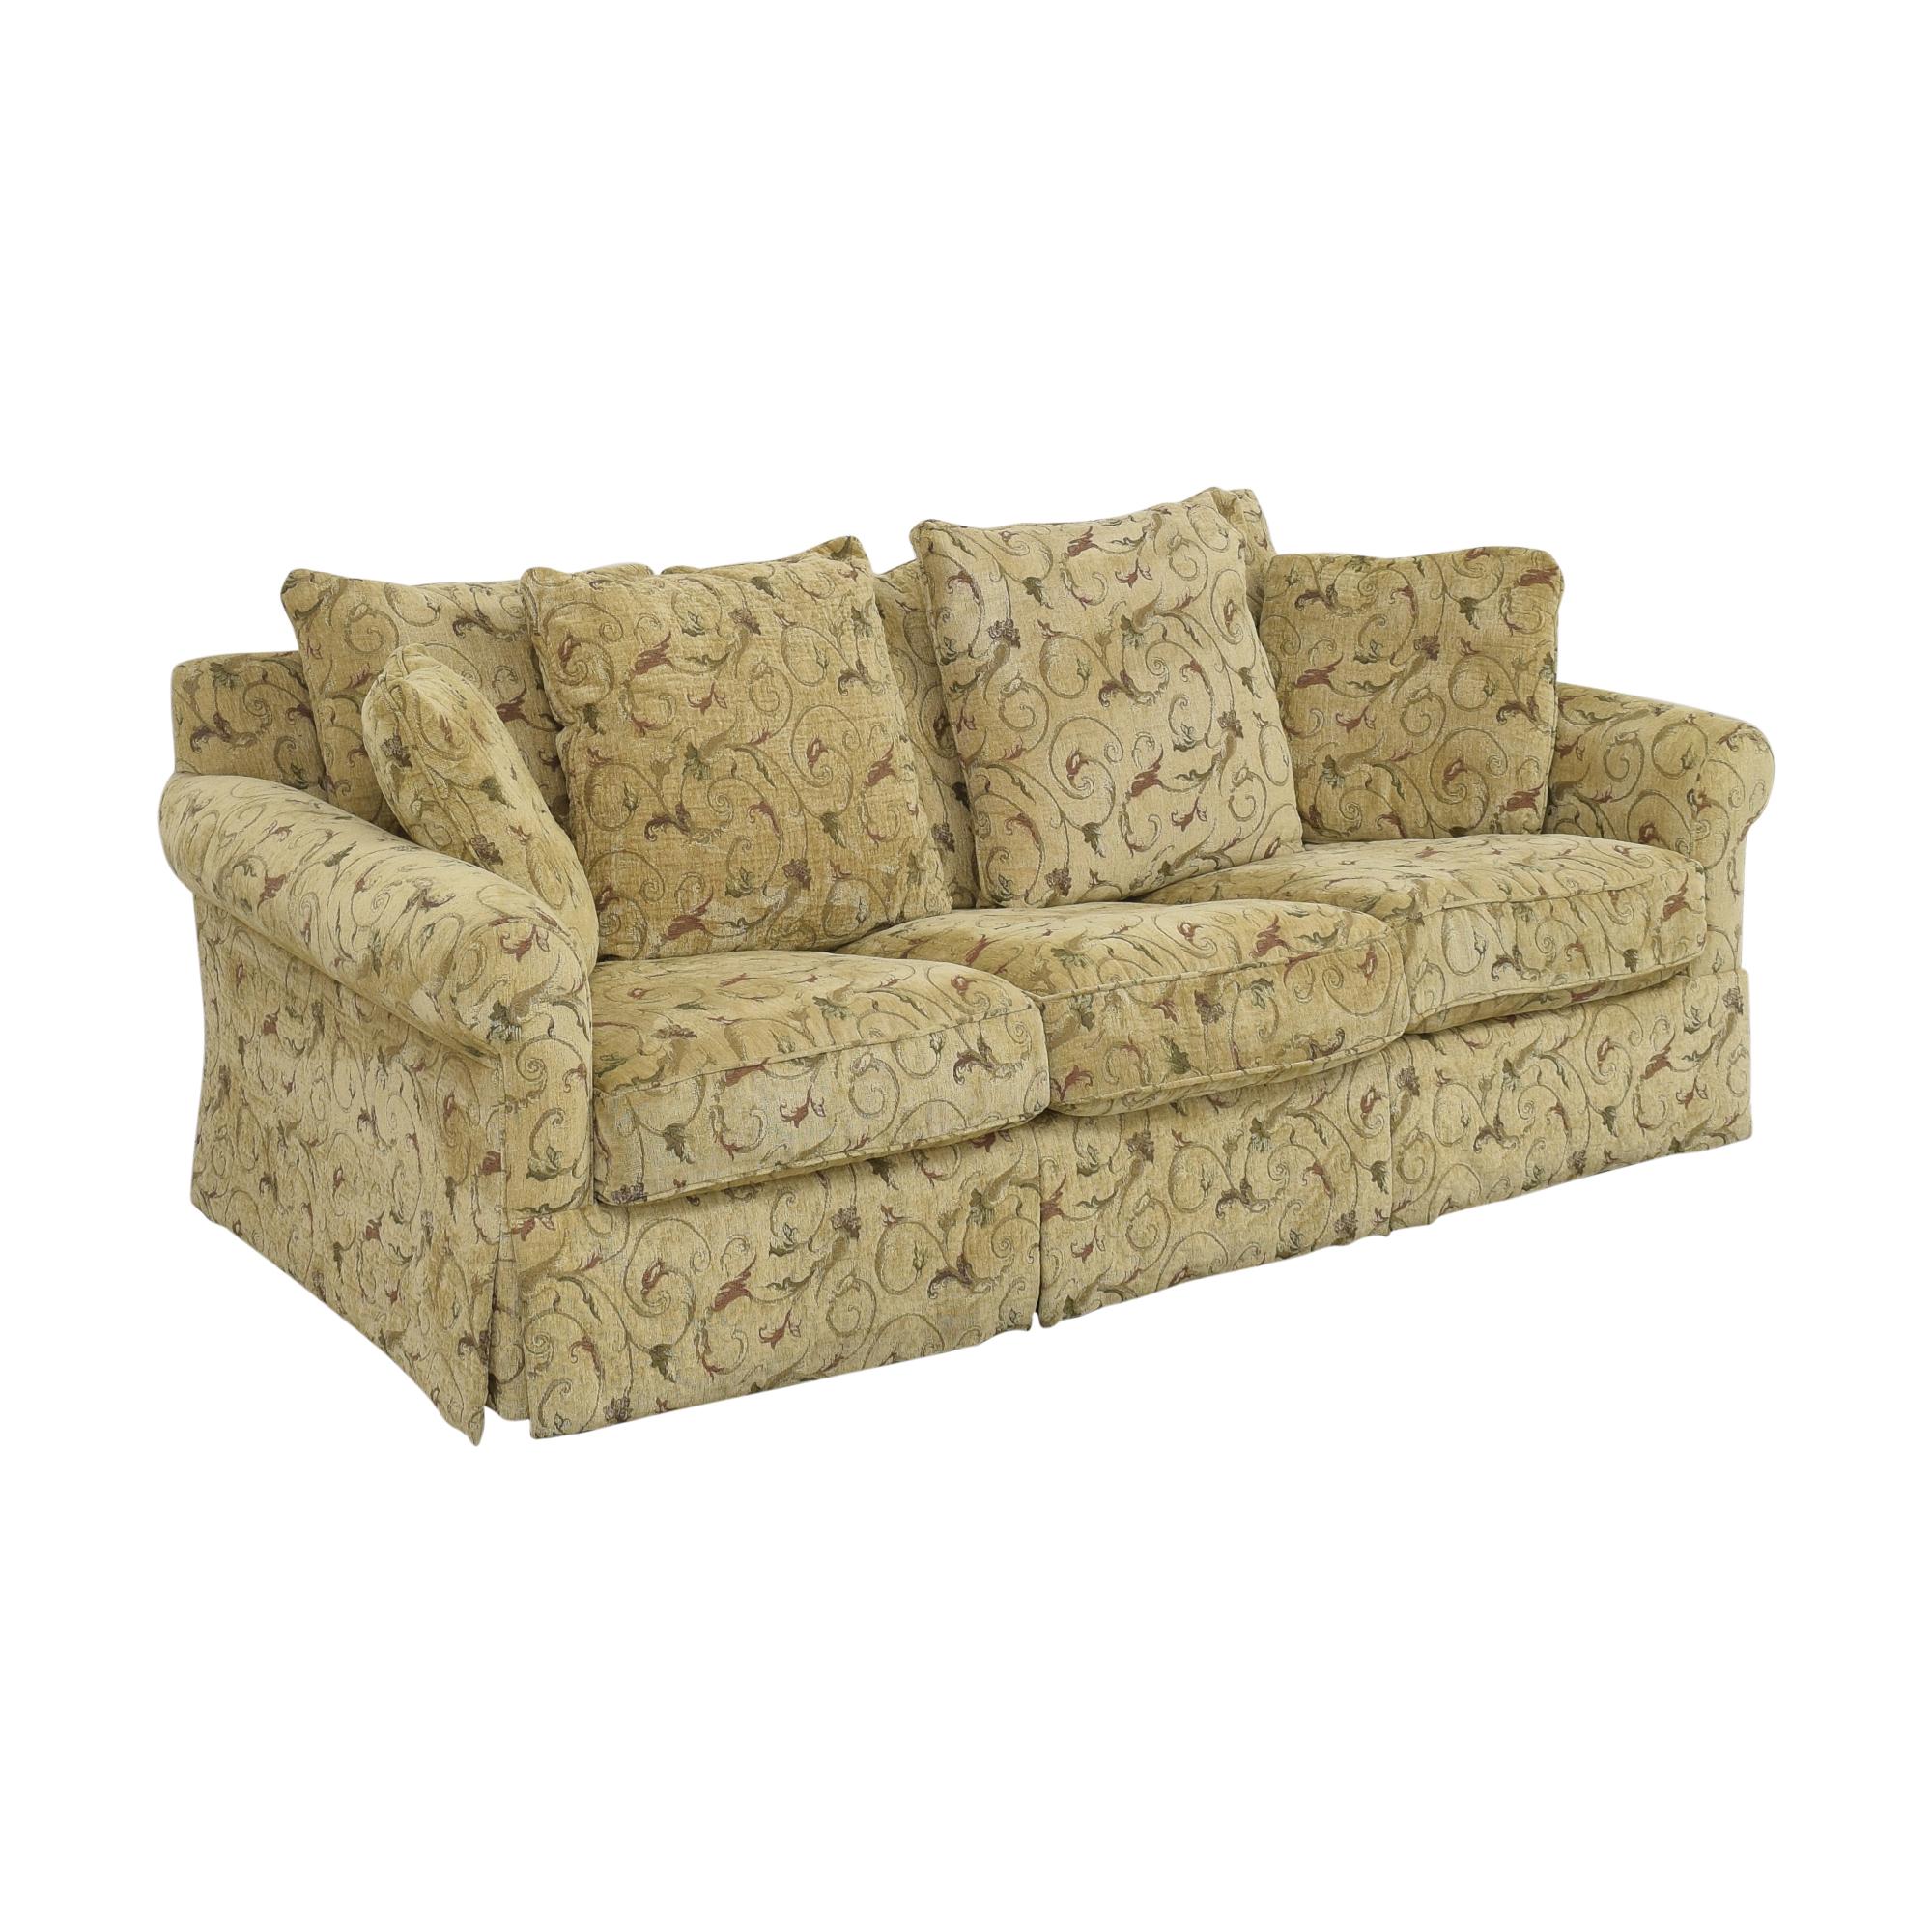 McCreary Modern McCreary Modern Sleeper Sofa Sofa Beds